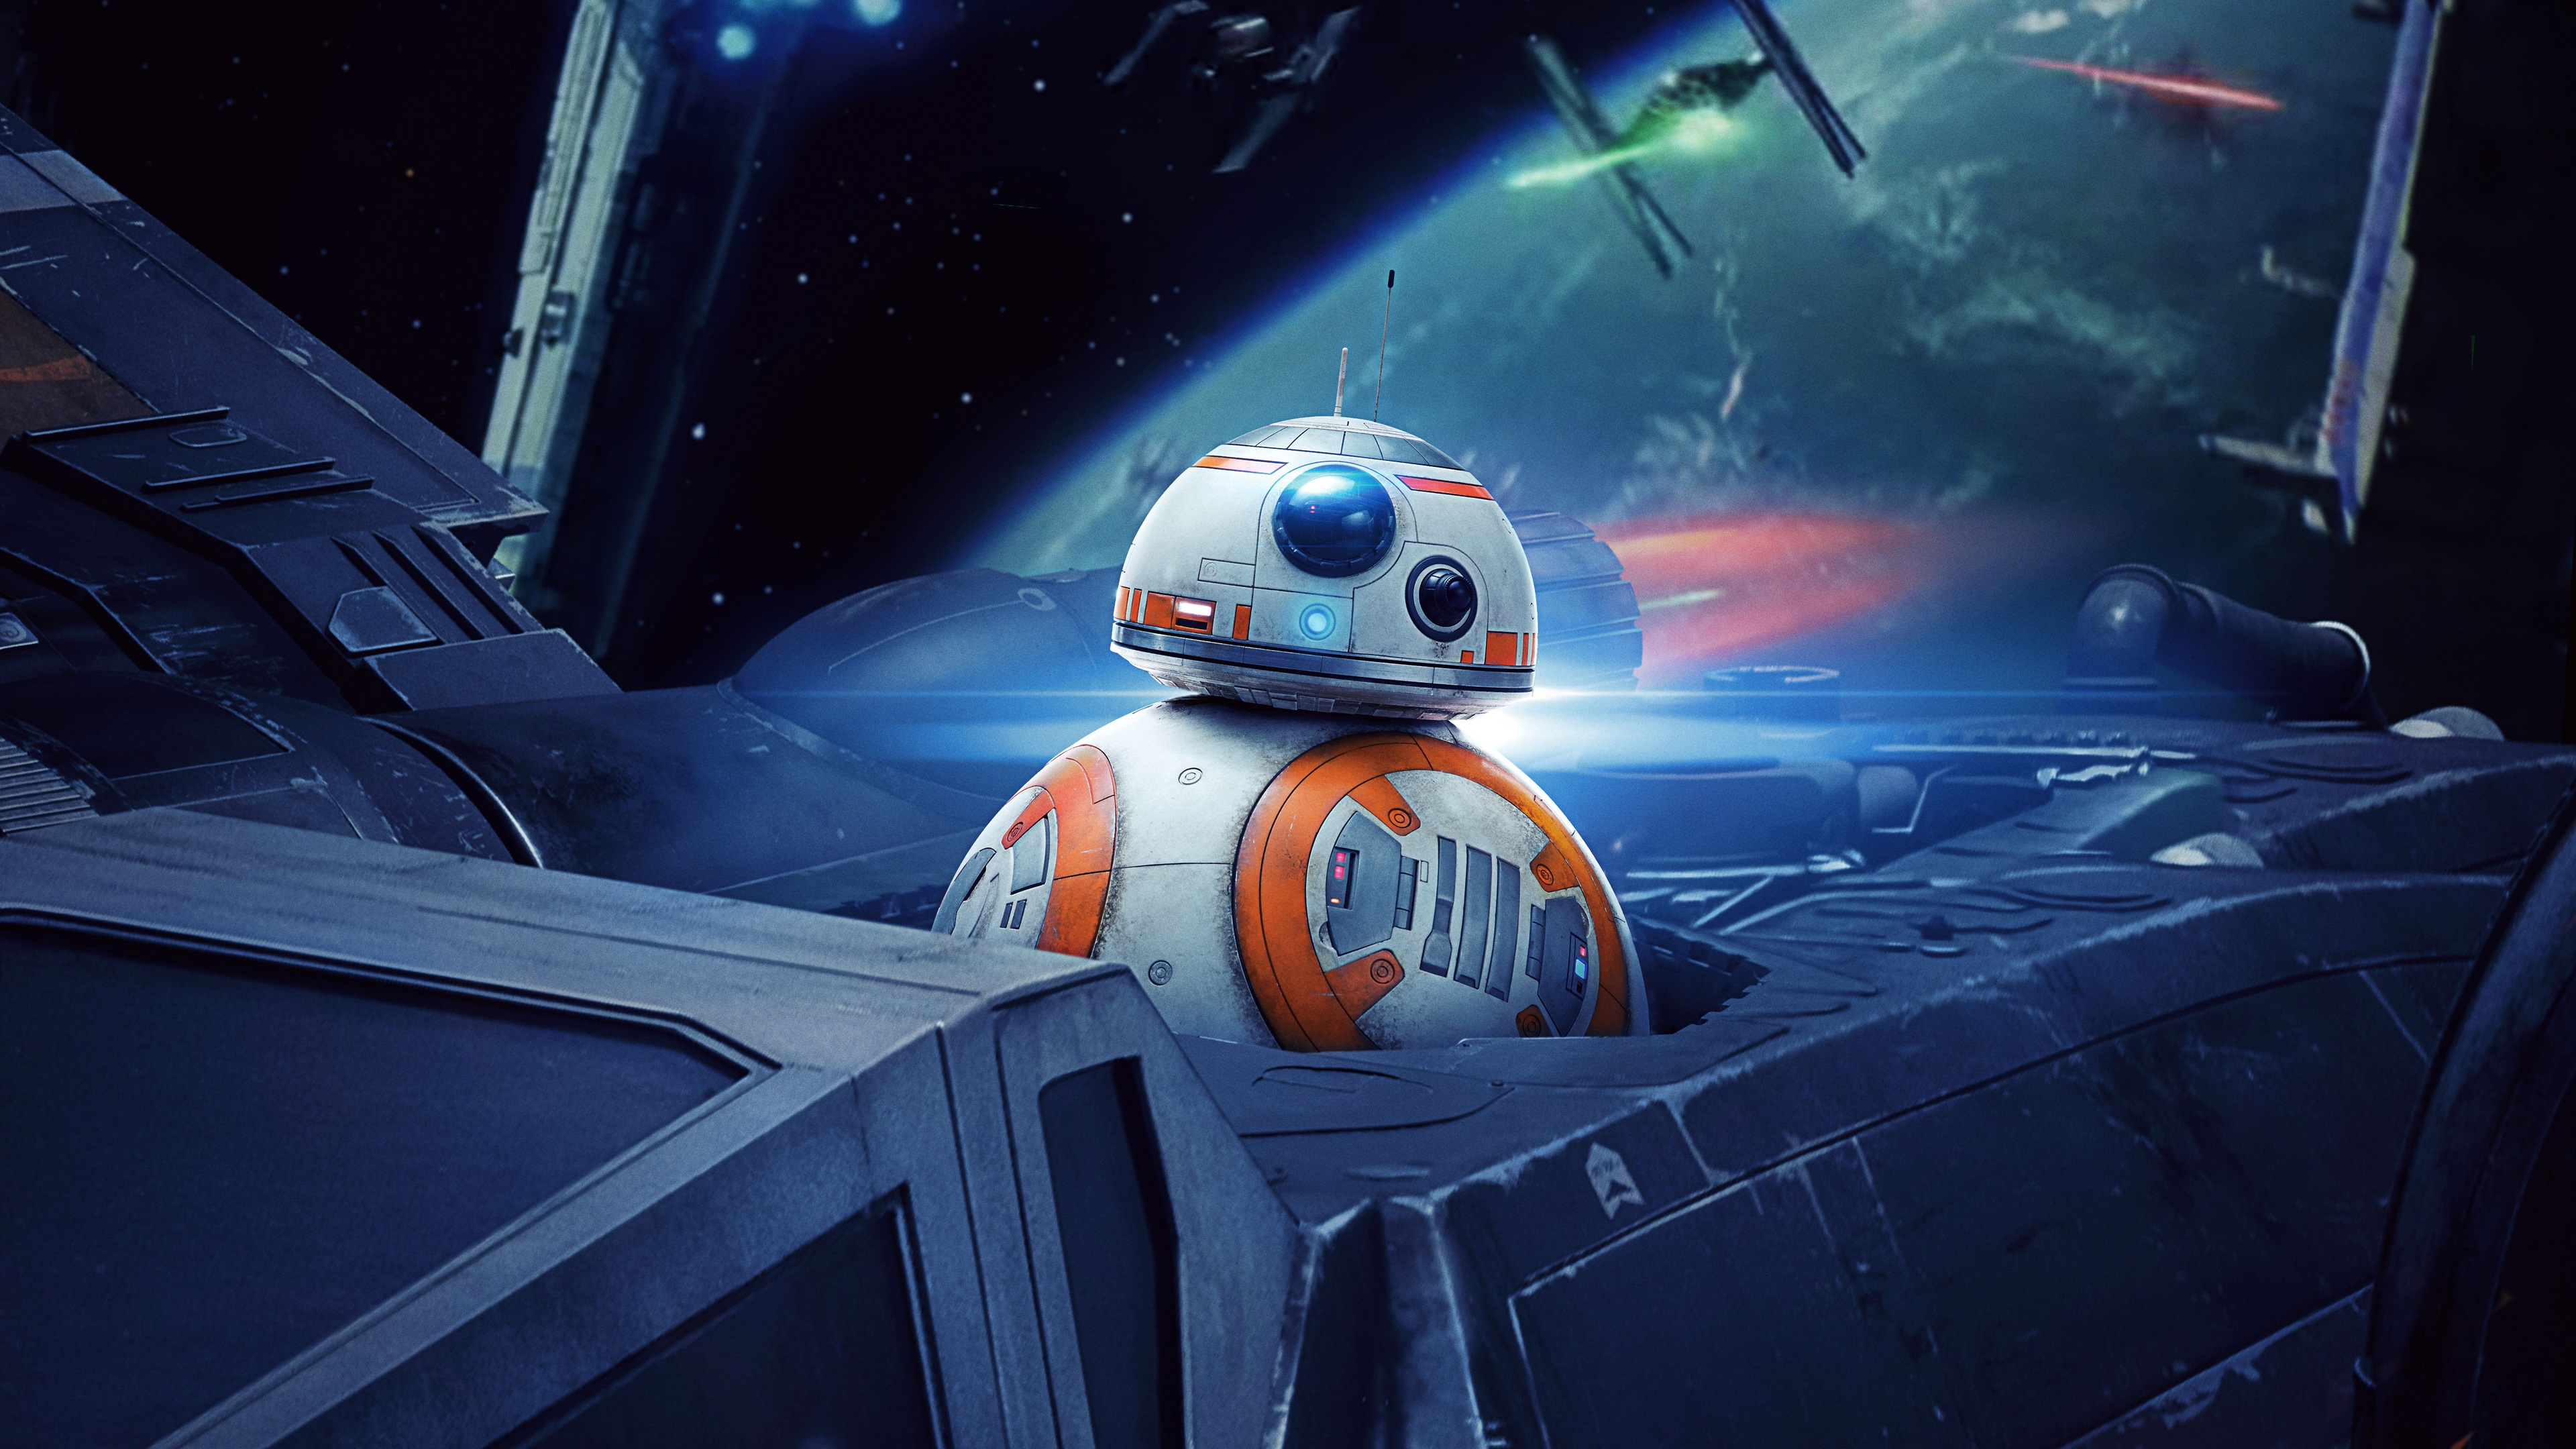 Fondos De Pantalla Star Wars Robot Bb8 Nave Espacial